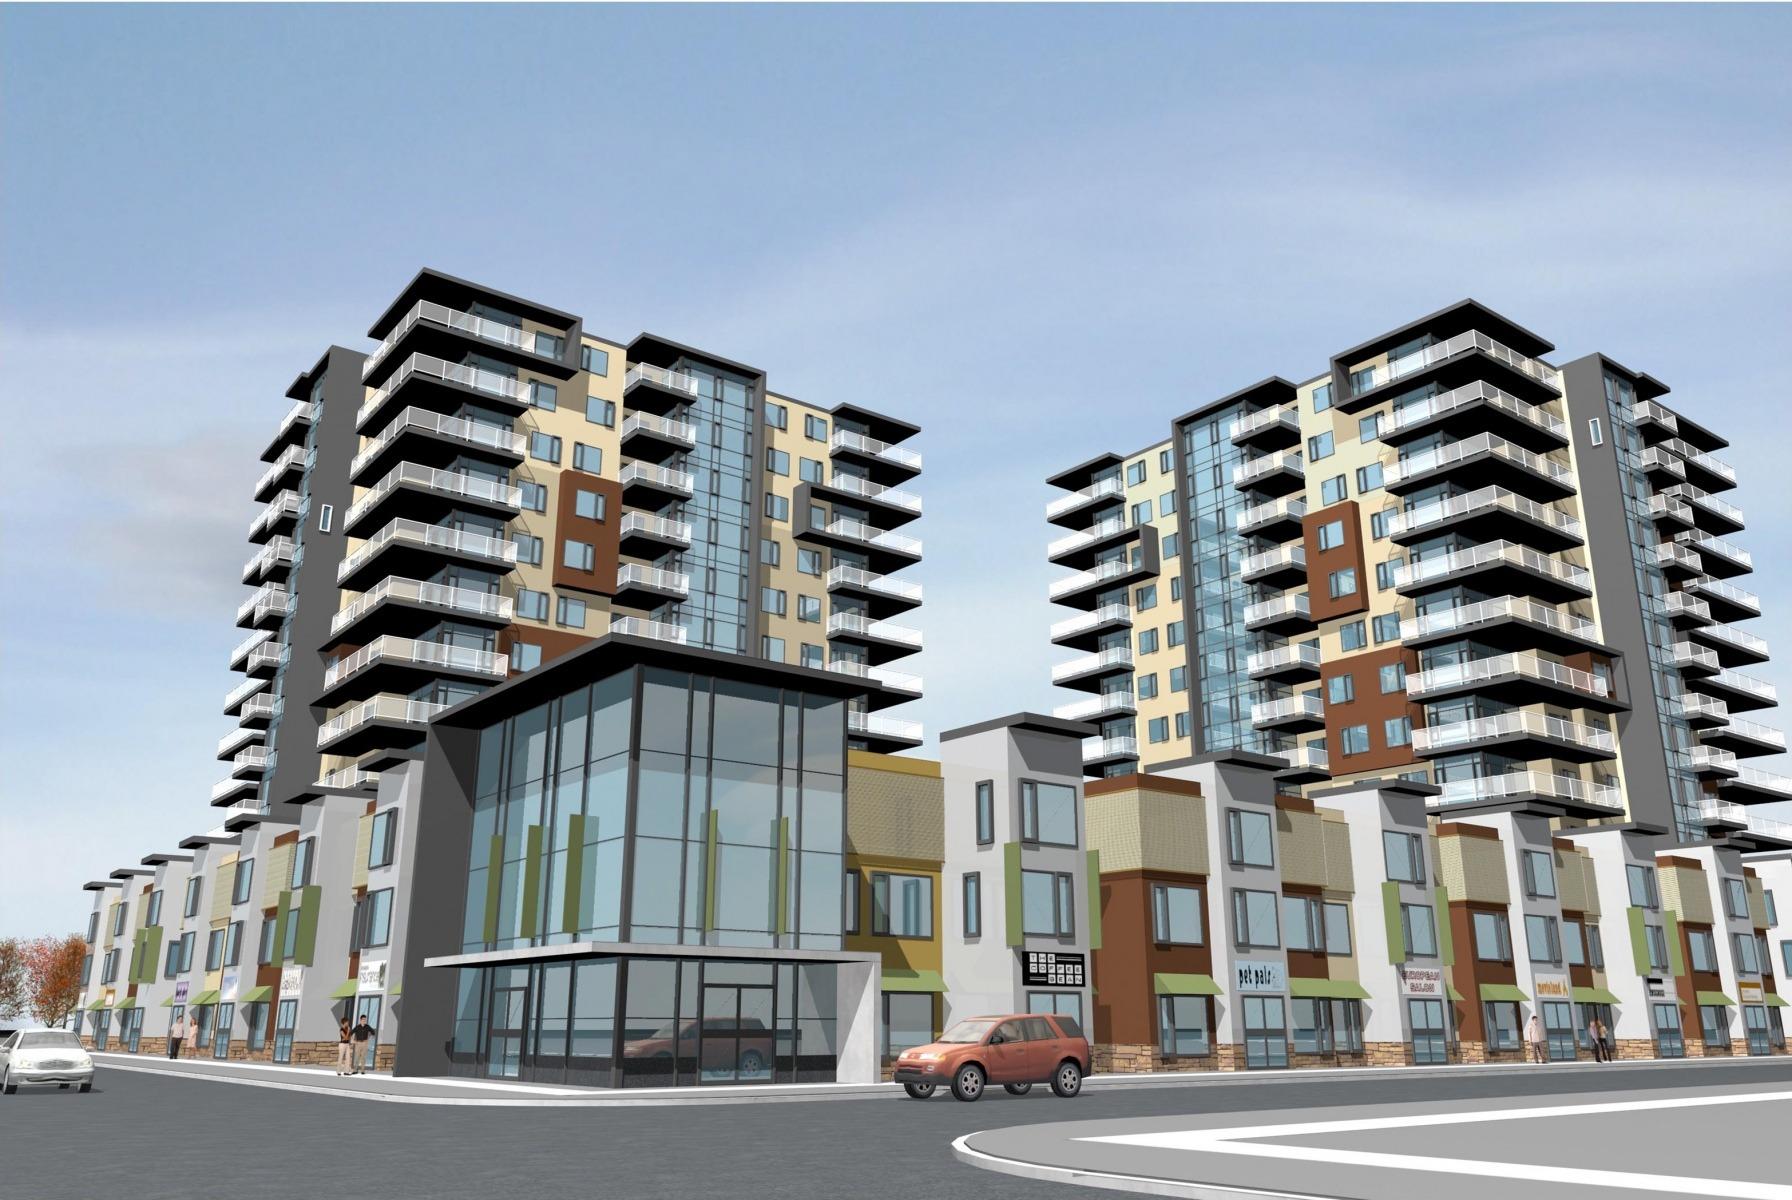 Pilot Square Mixed-Use Development – Proposal